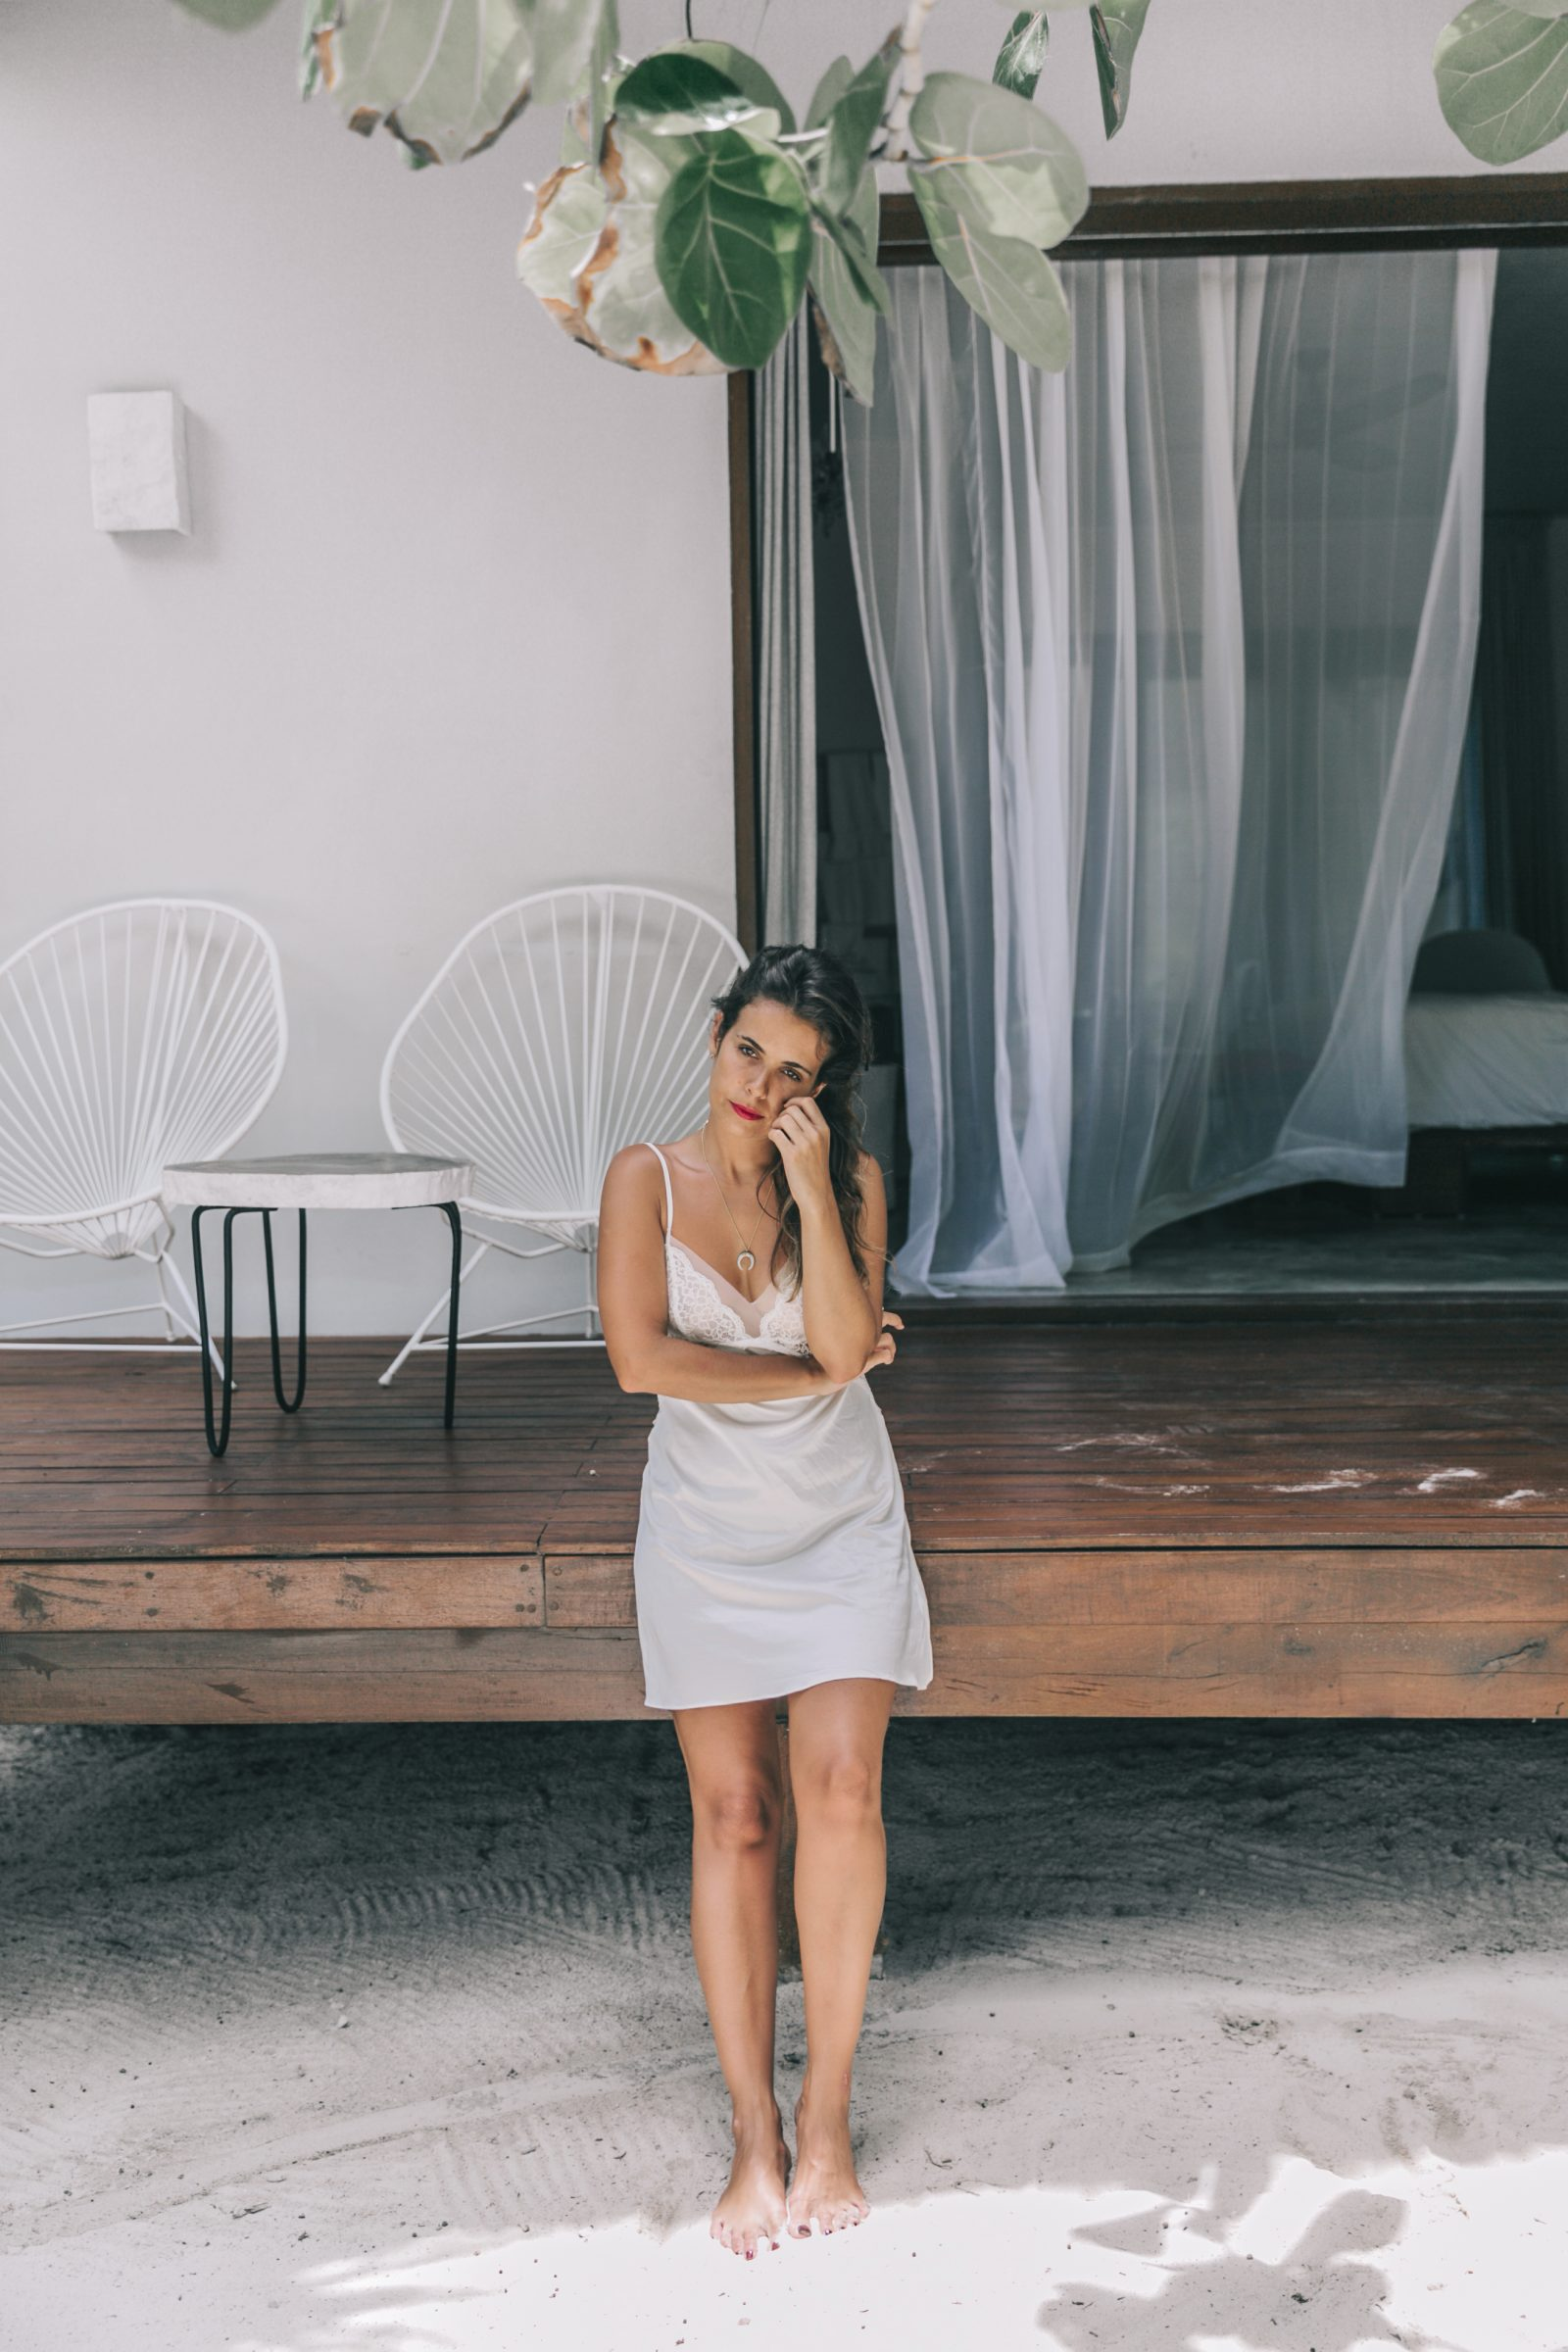 slip_dress-sanara_tulum-beach-mexico-outfit-collage_vintage-92